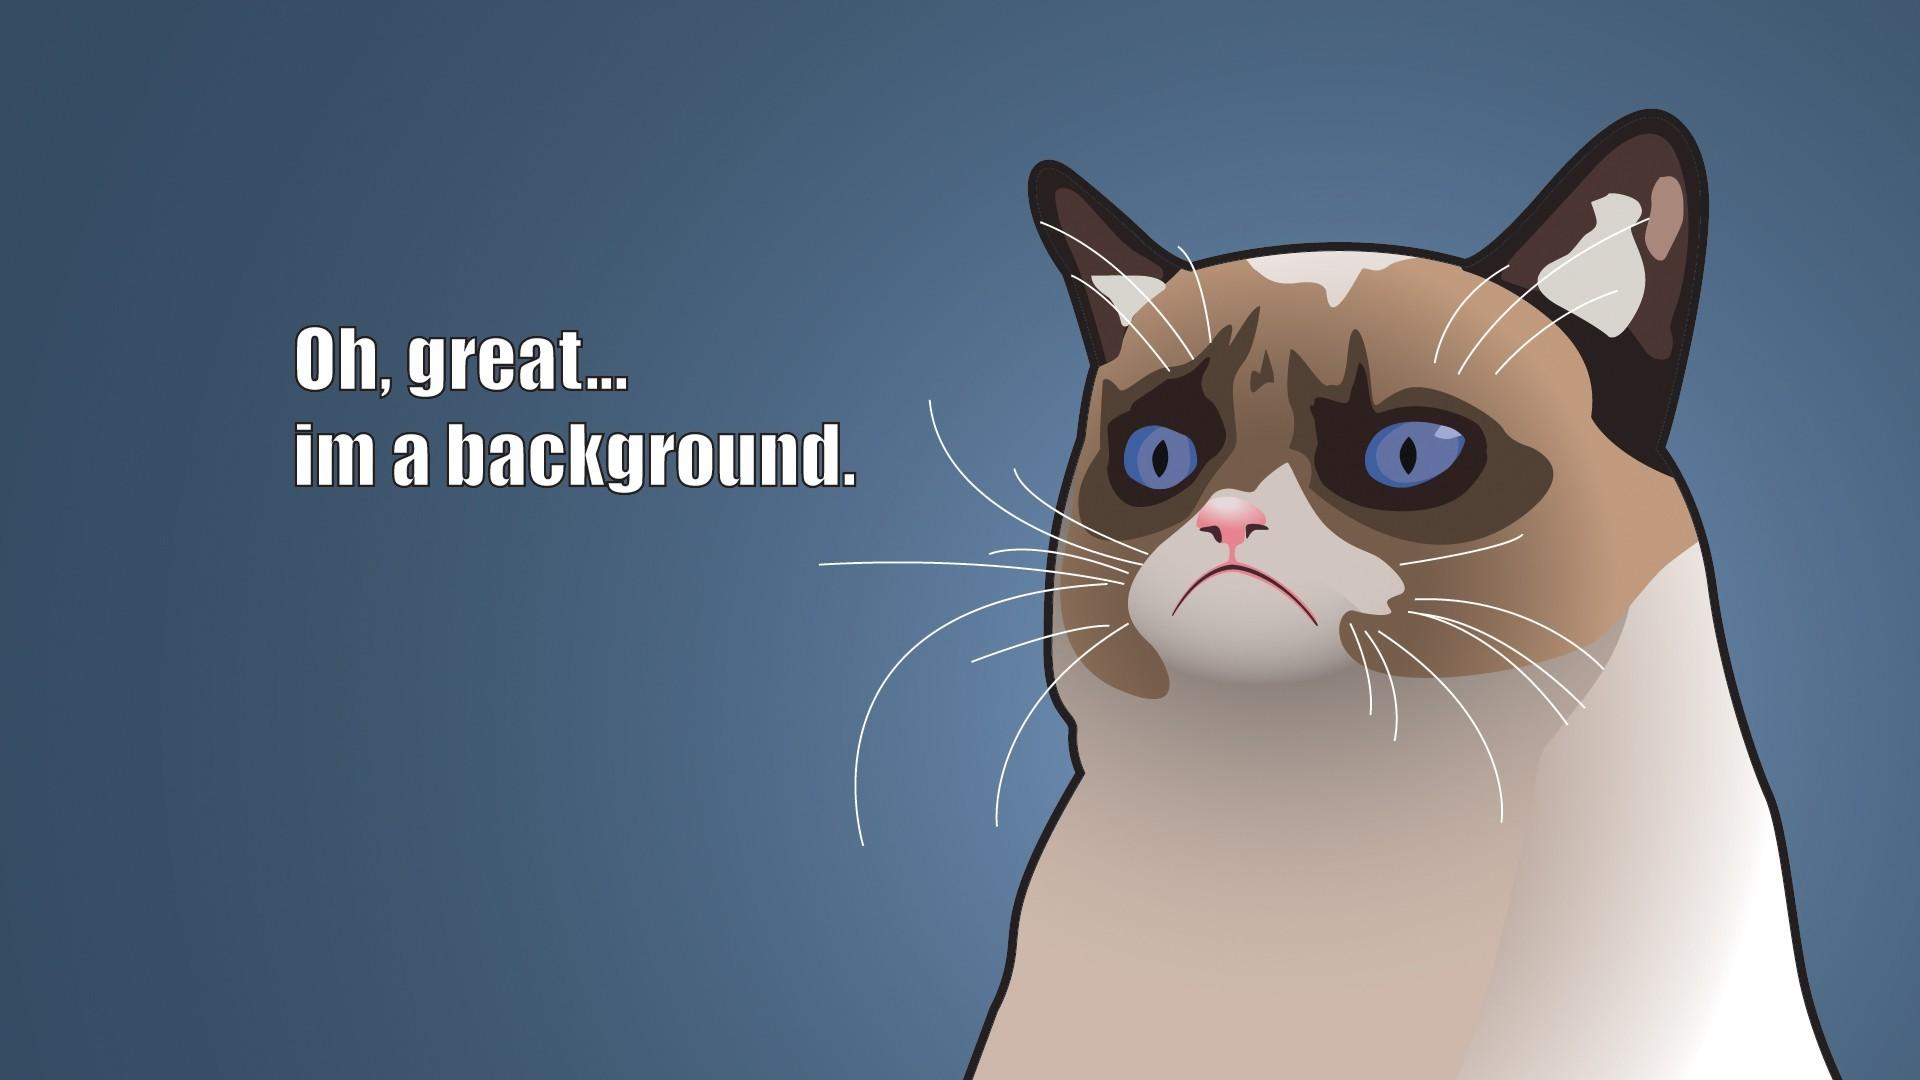 Cute Dogs Full Hd Wallpapers Warrior Cats Wallpaper Desktop 183 ① Wallpapertag